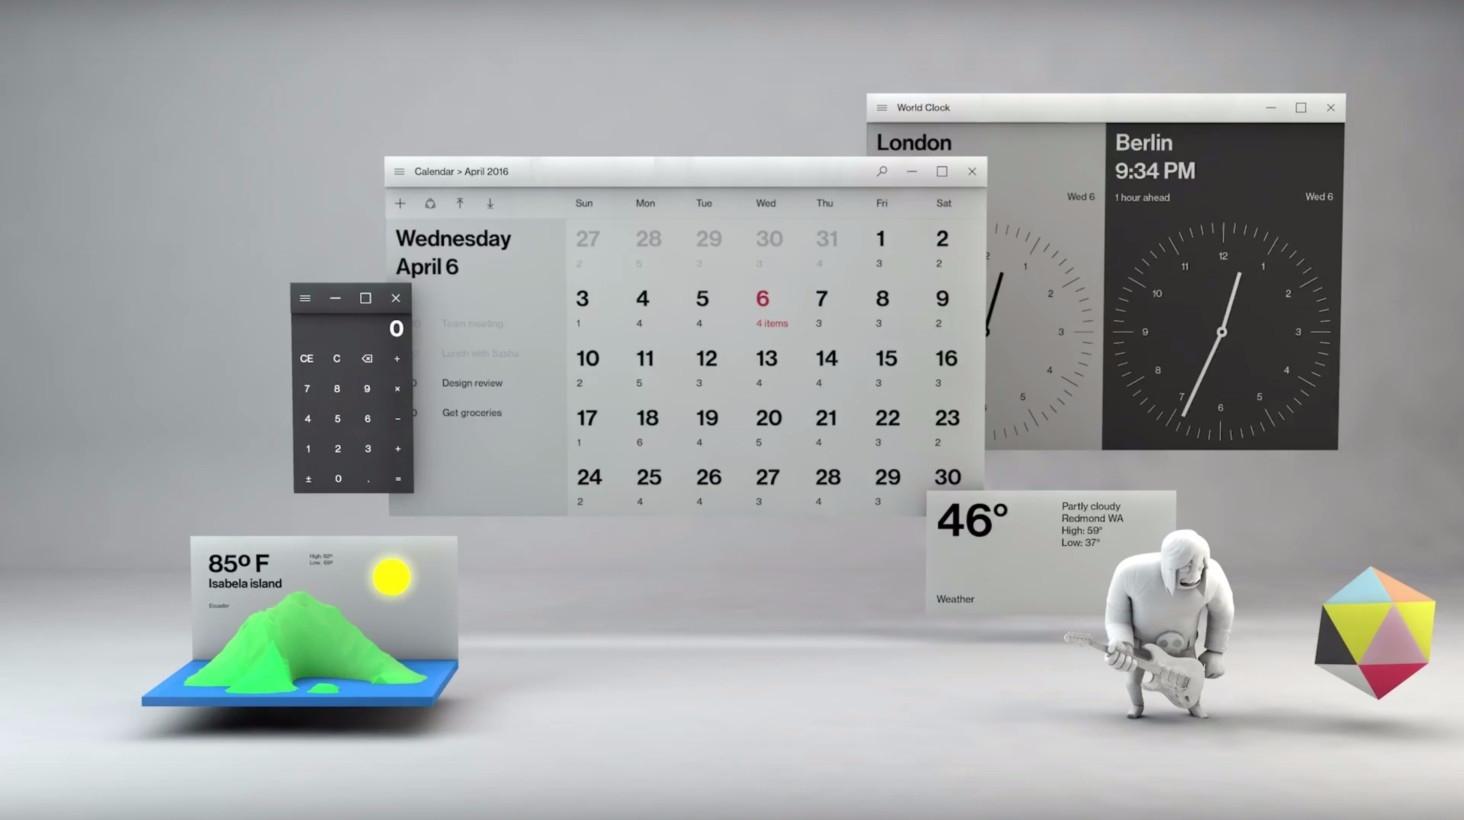 Fluent Design System. 2017 Micr - ellowebdesign | ello